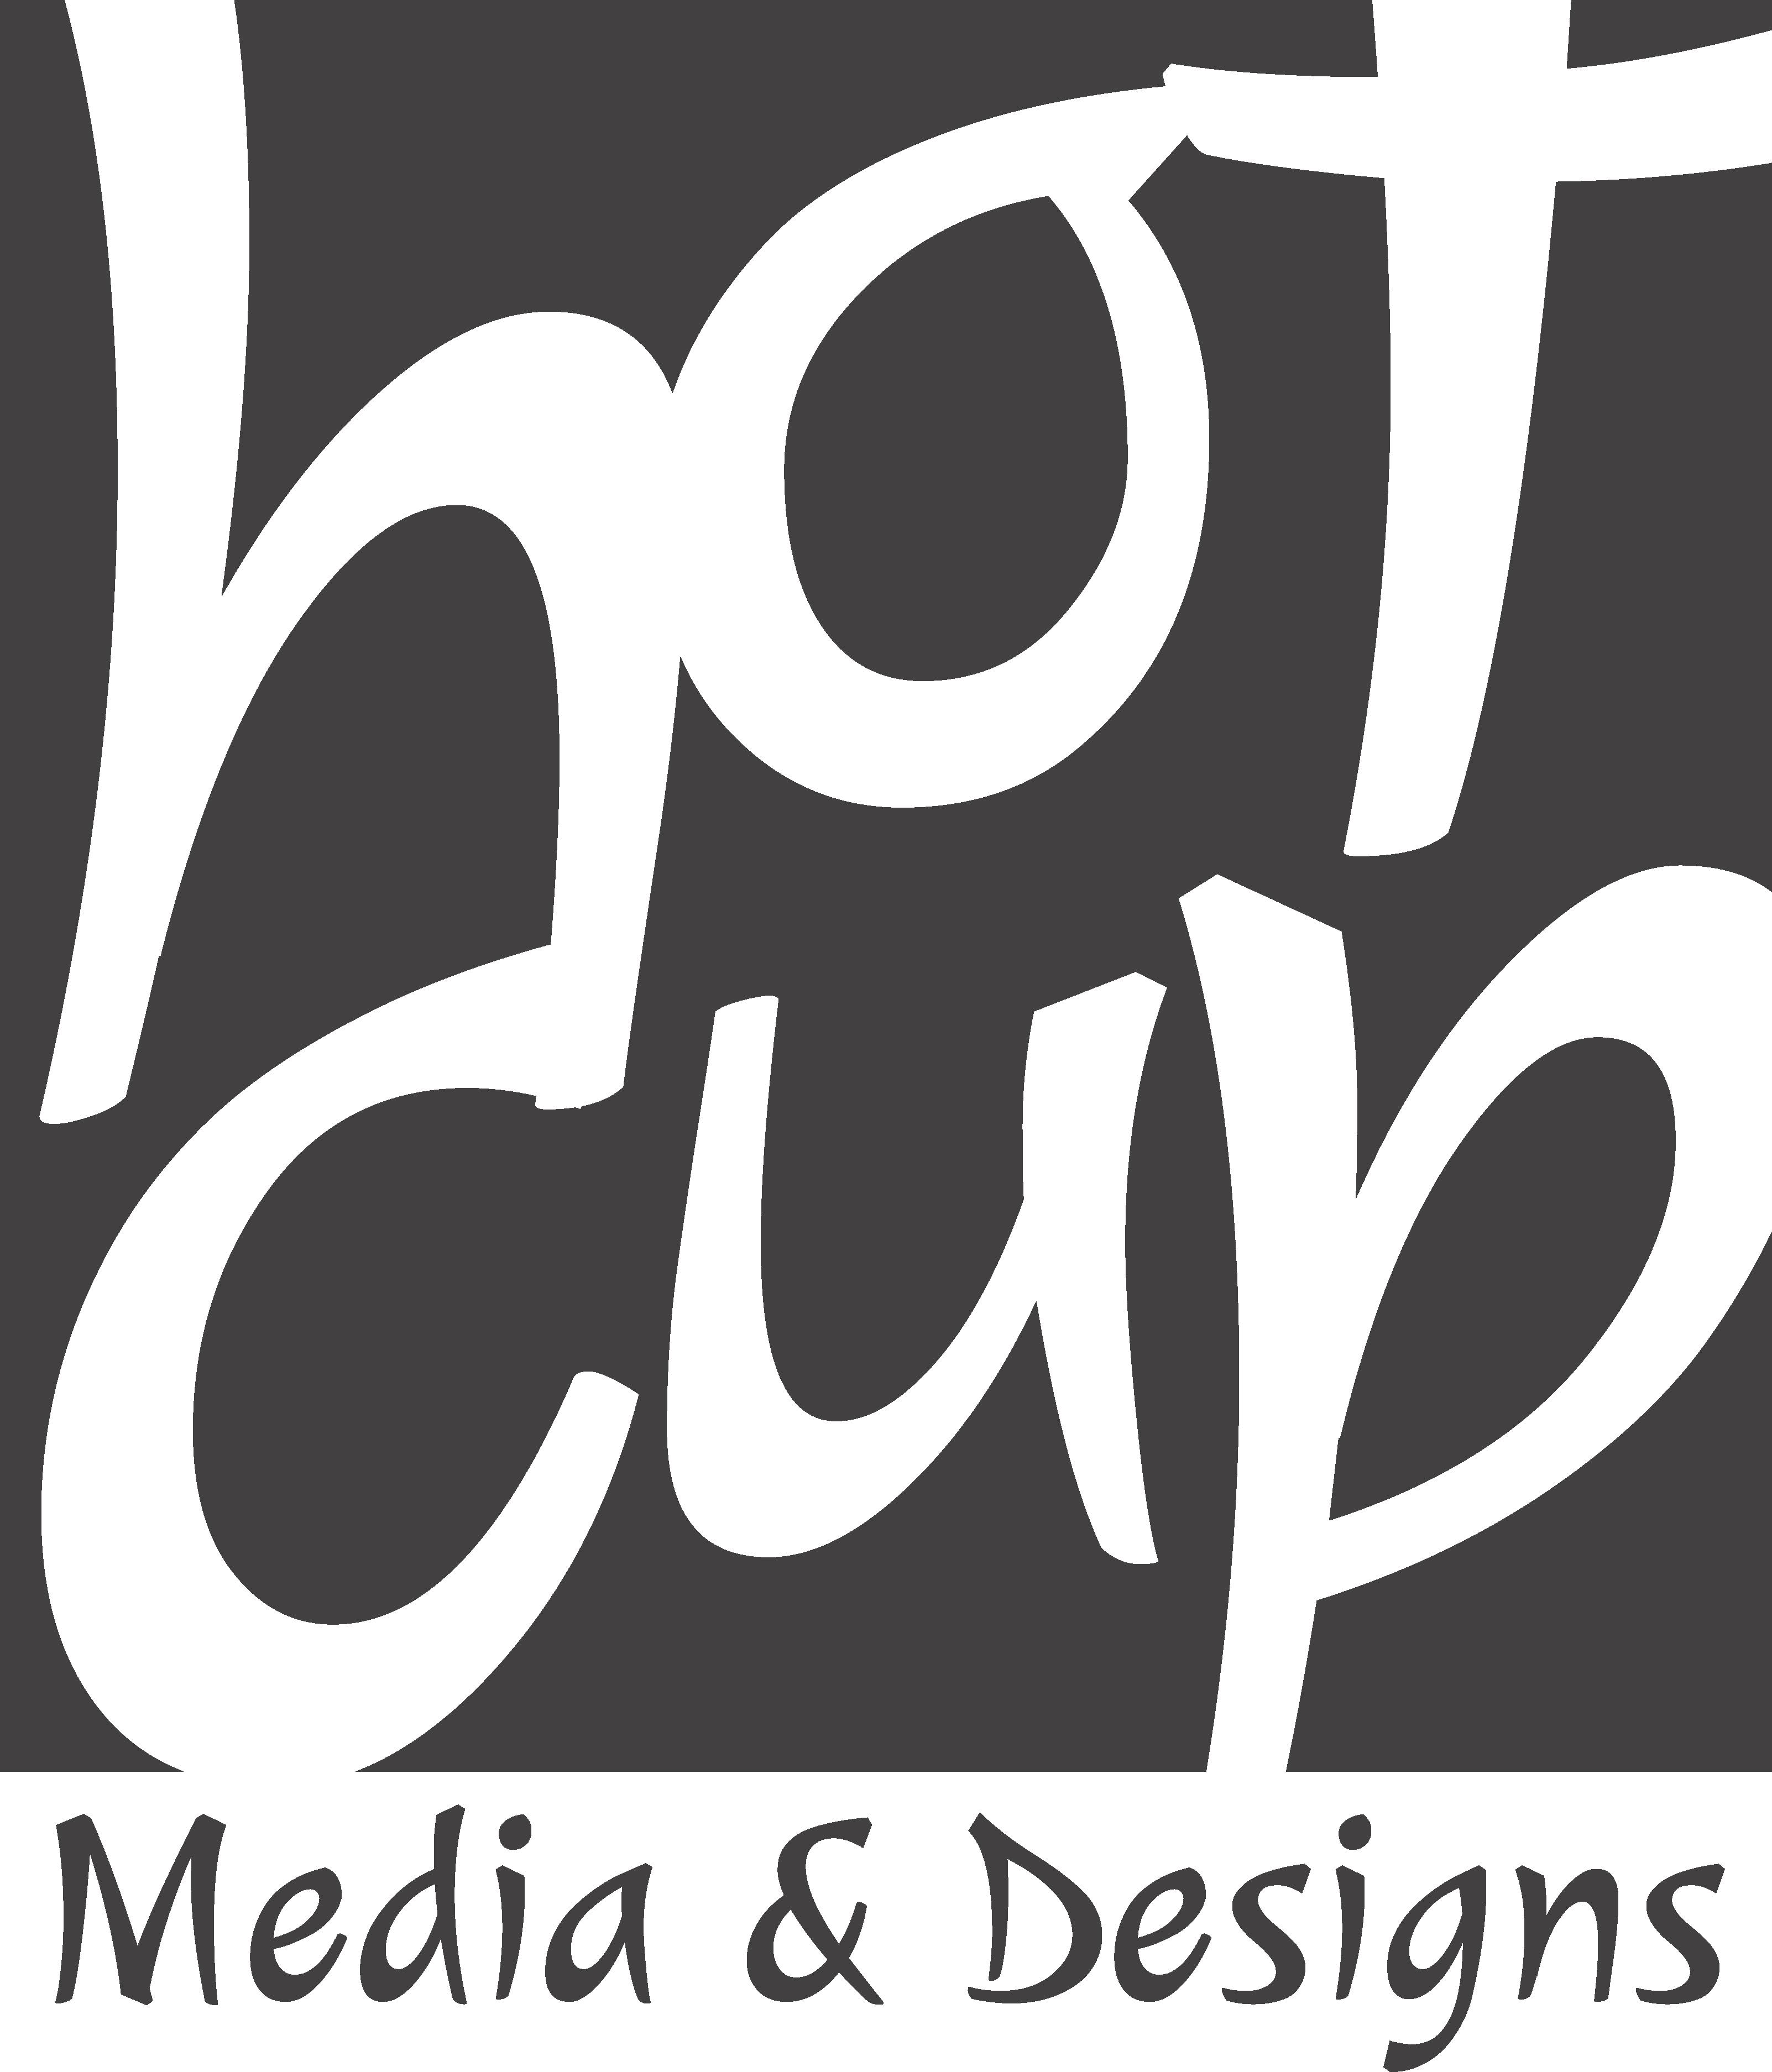 Hot Cup Media & Designs